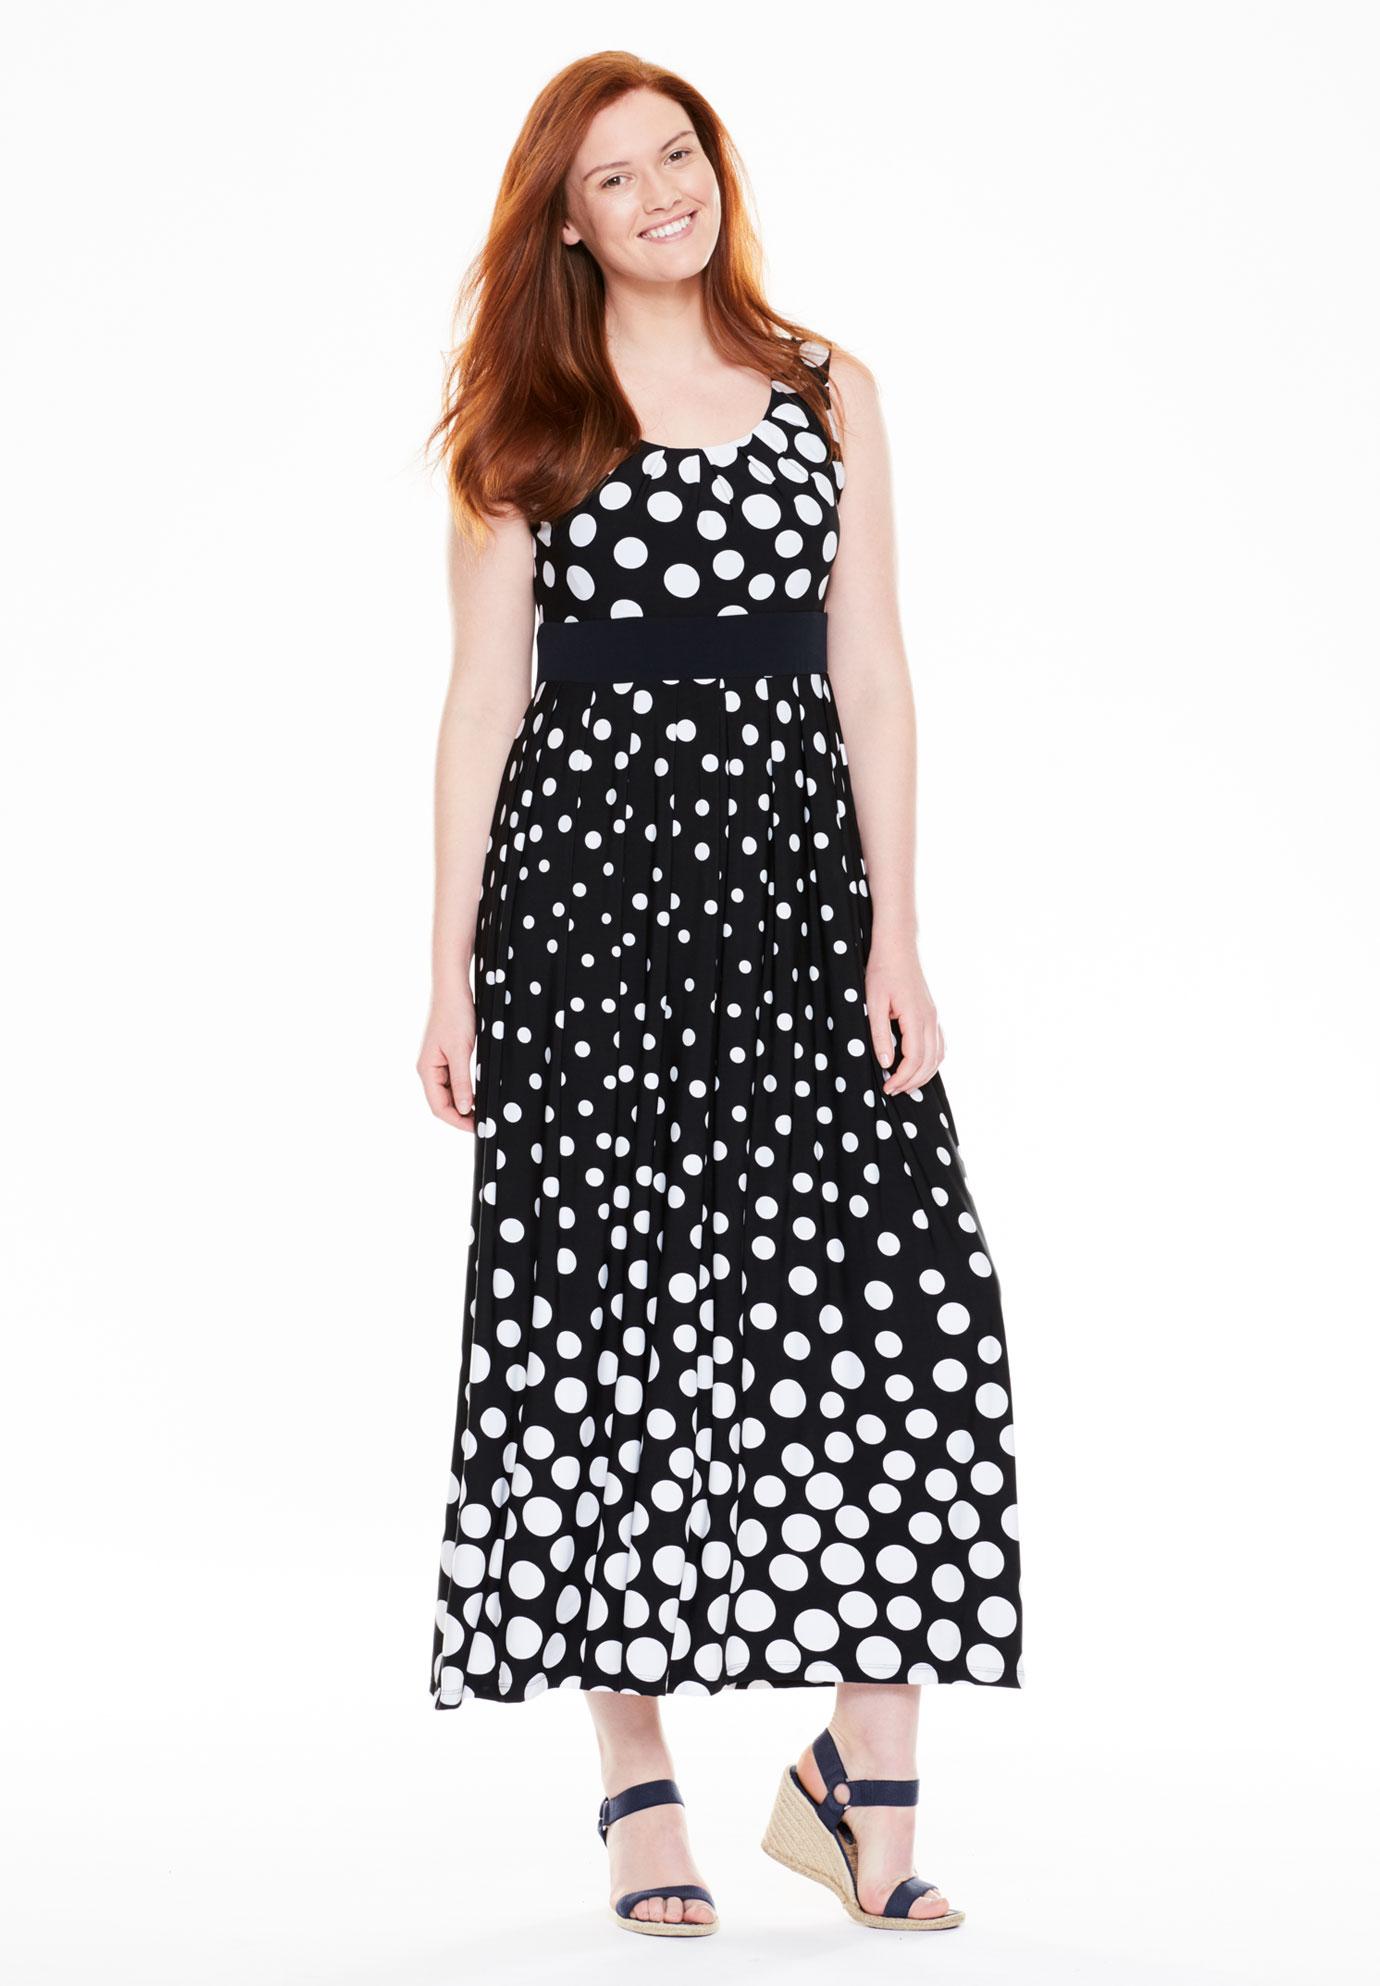 Dress, with polka dots in maxi length, BLACK WHITE DOT, hi-res